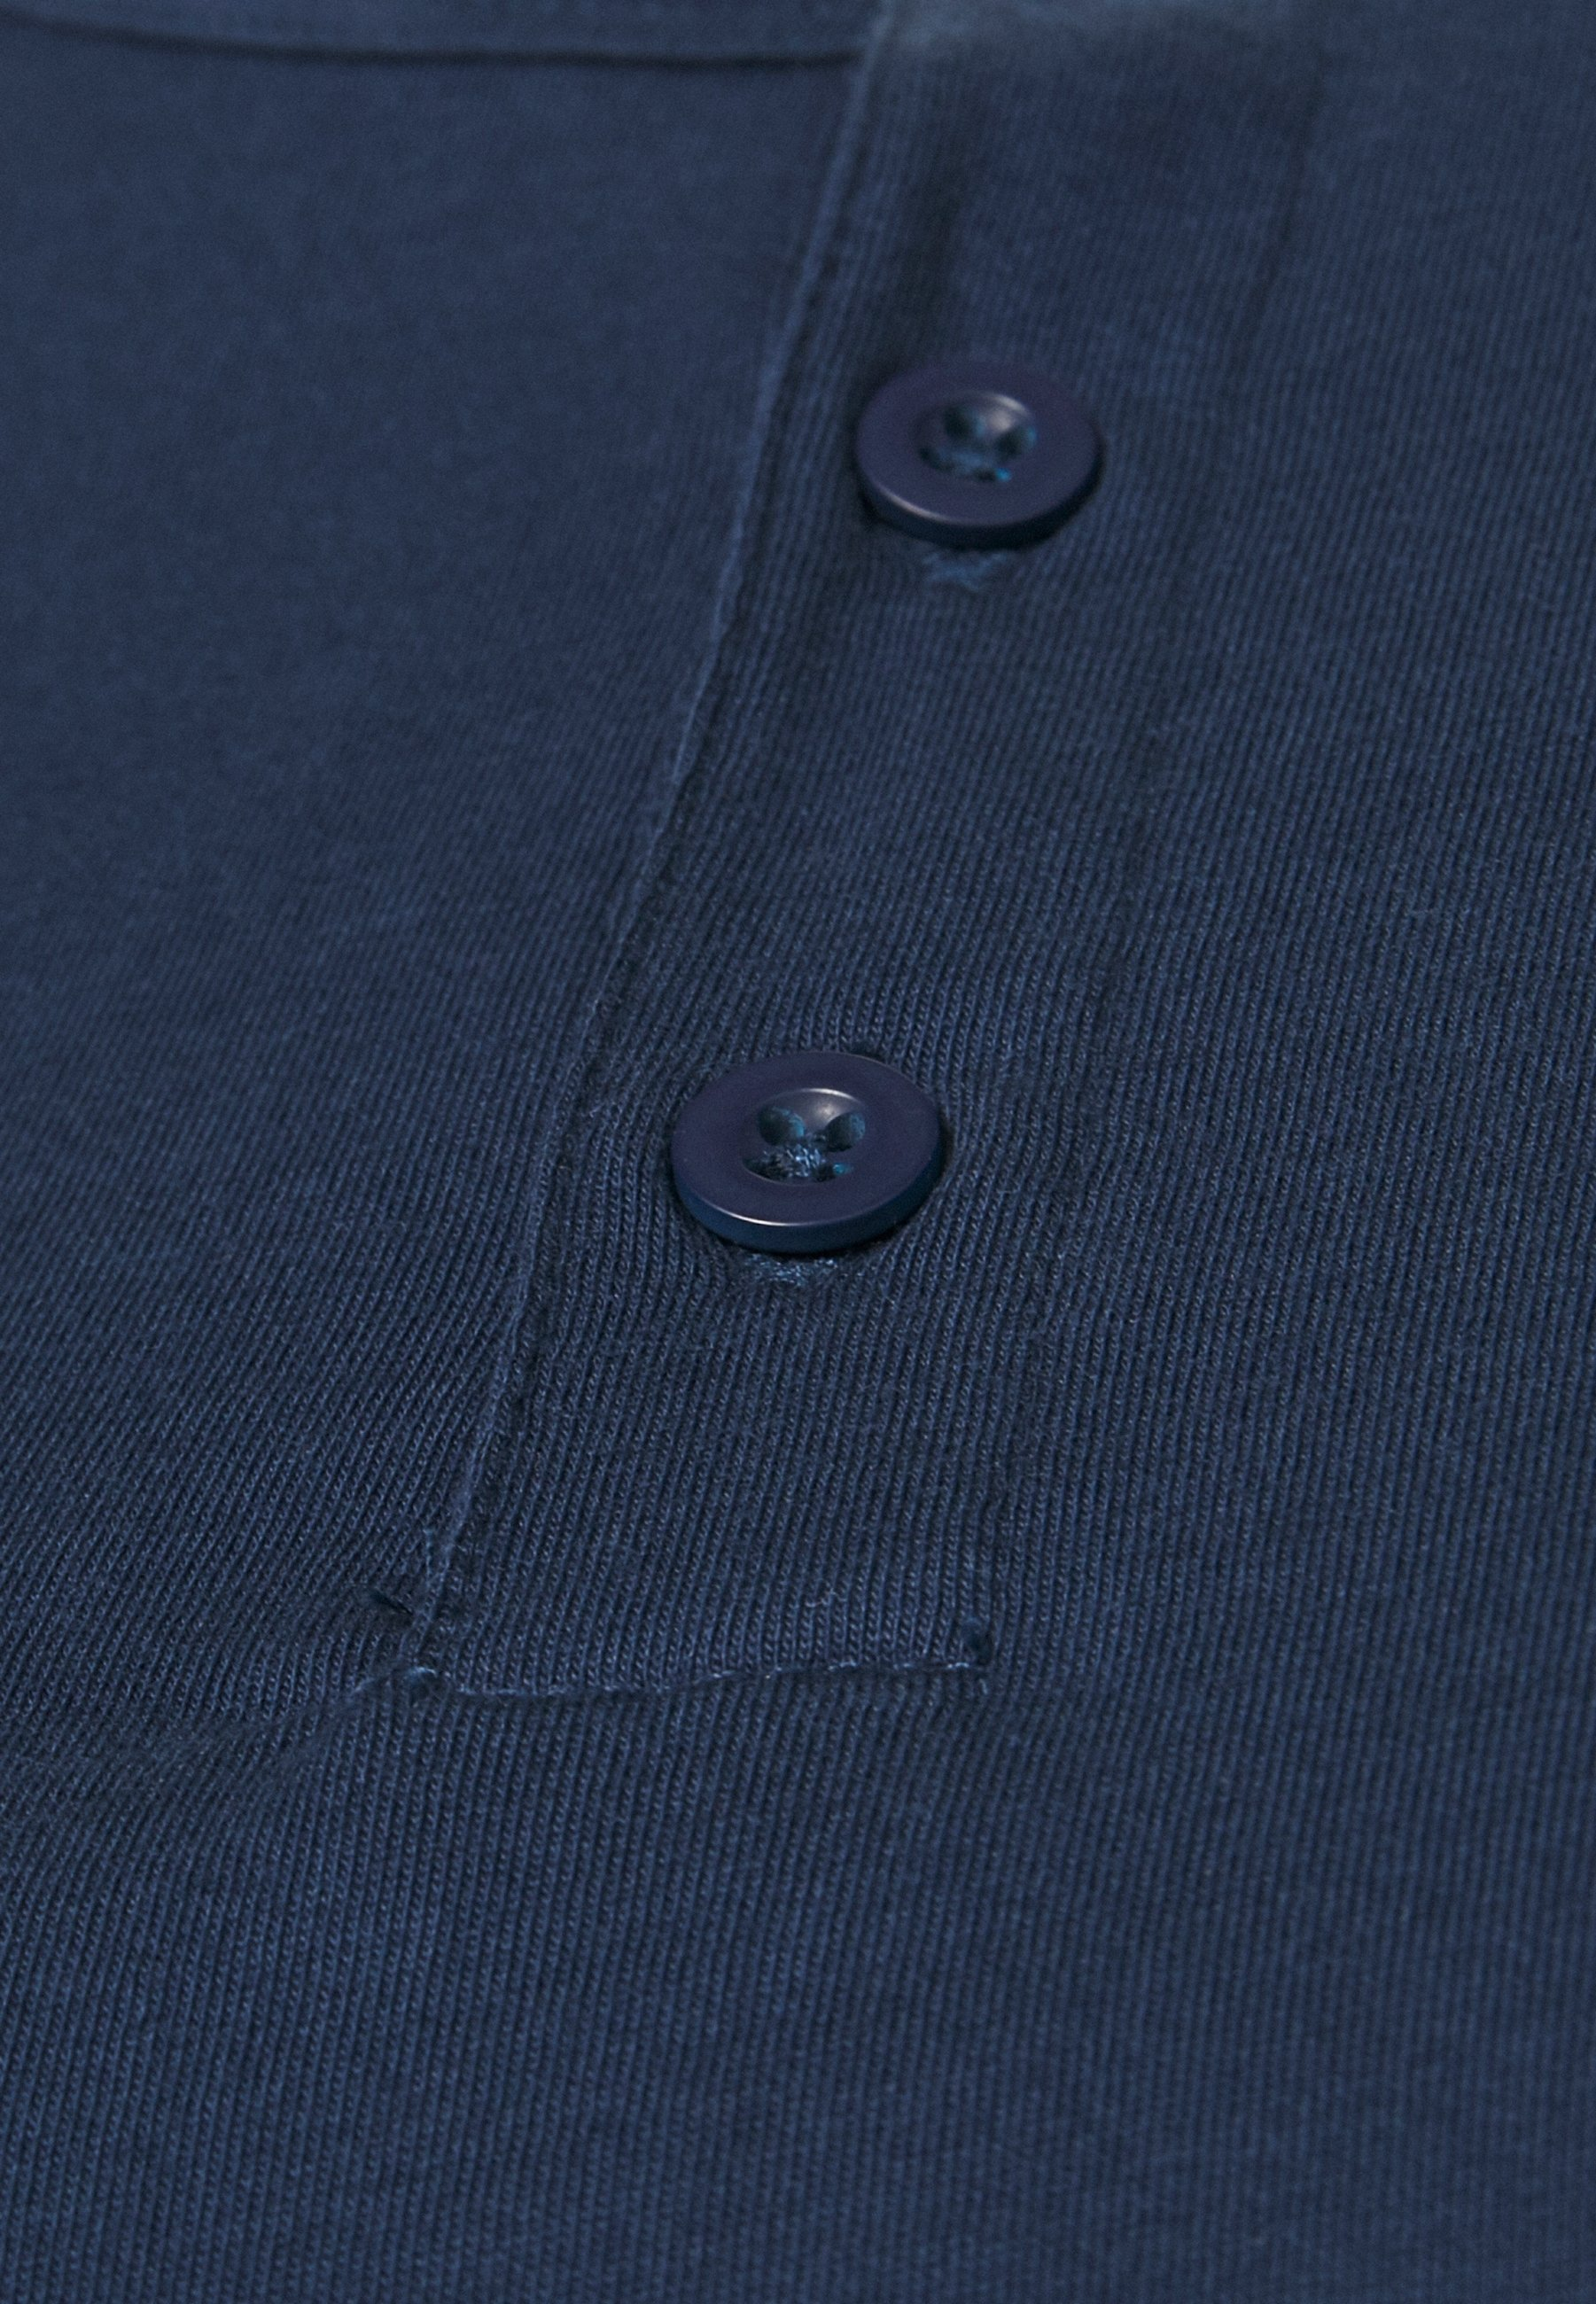 Casa Amuk LONG SLEEVE TEE - Långärmad tröja - steel blue - Damkläder g1ysC